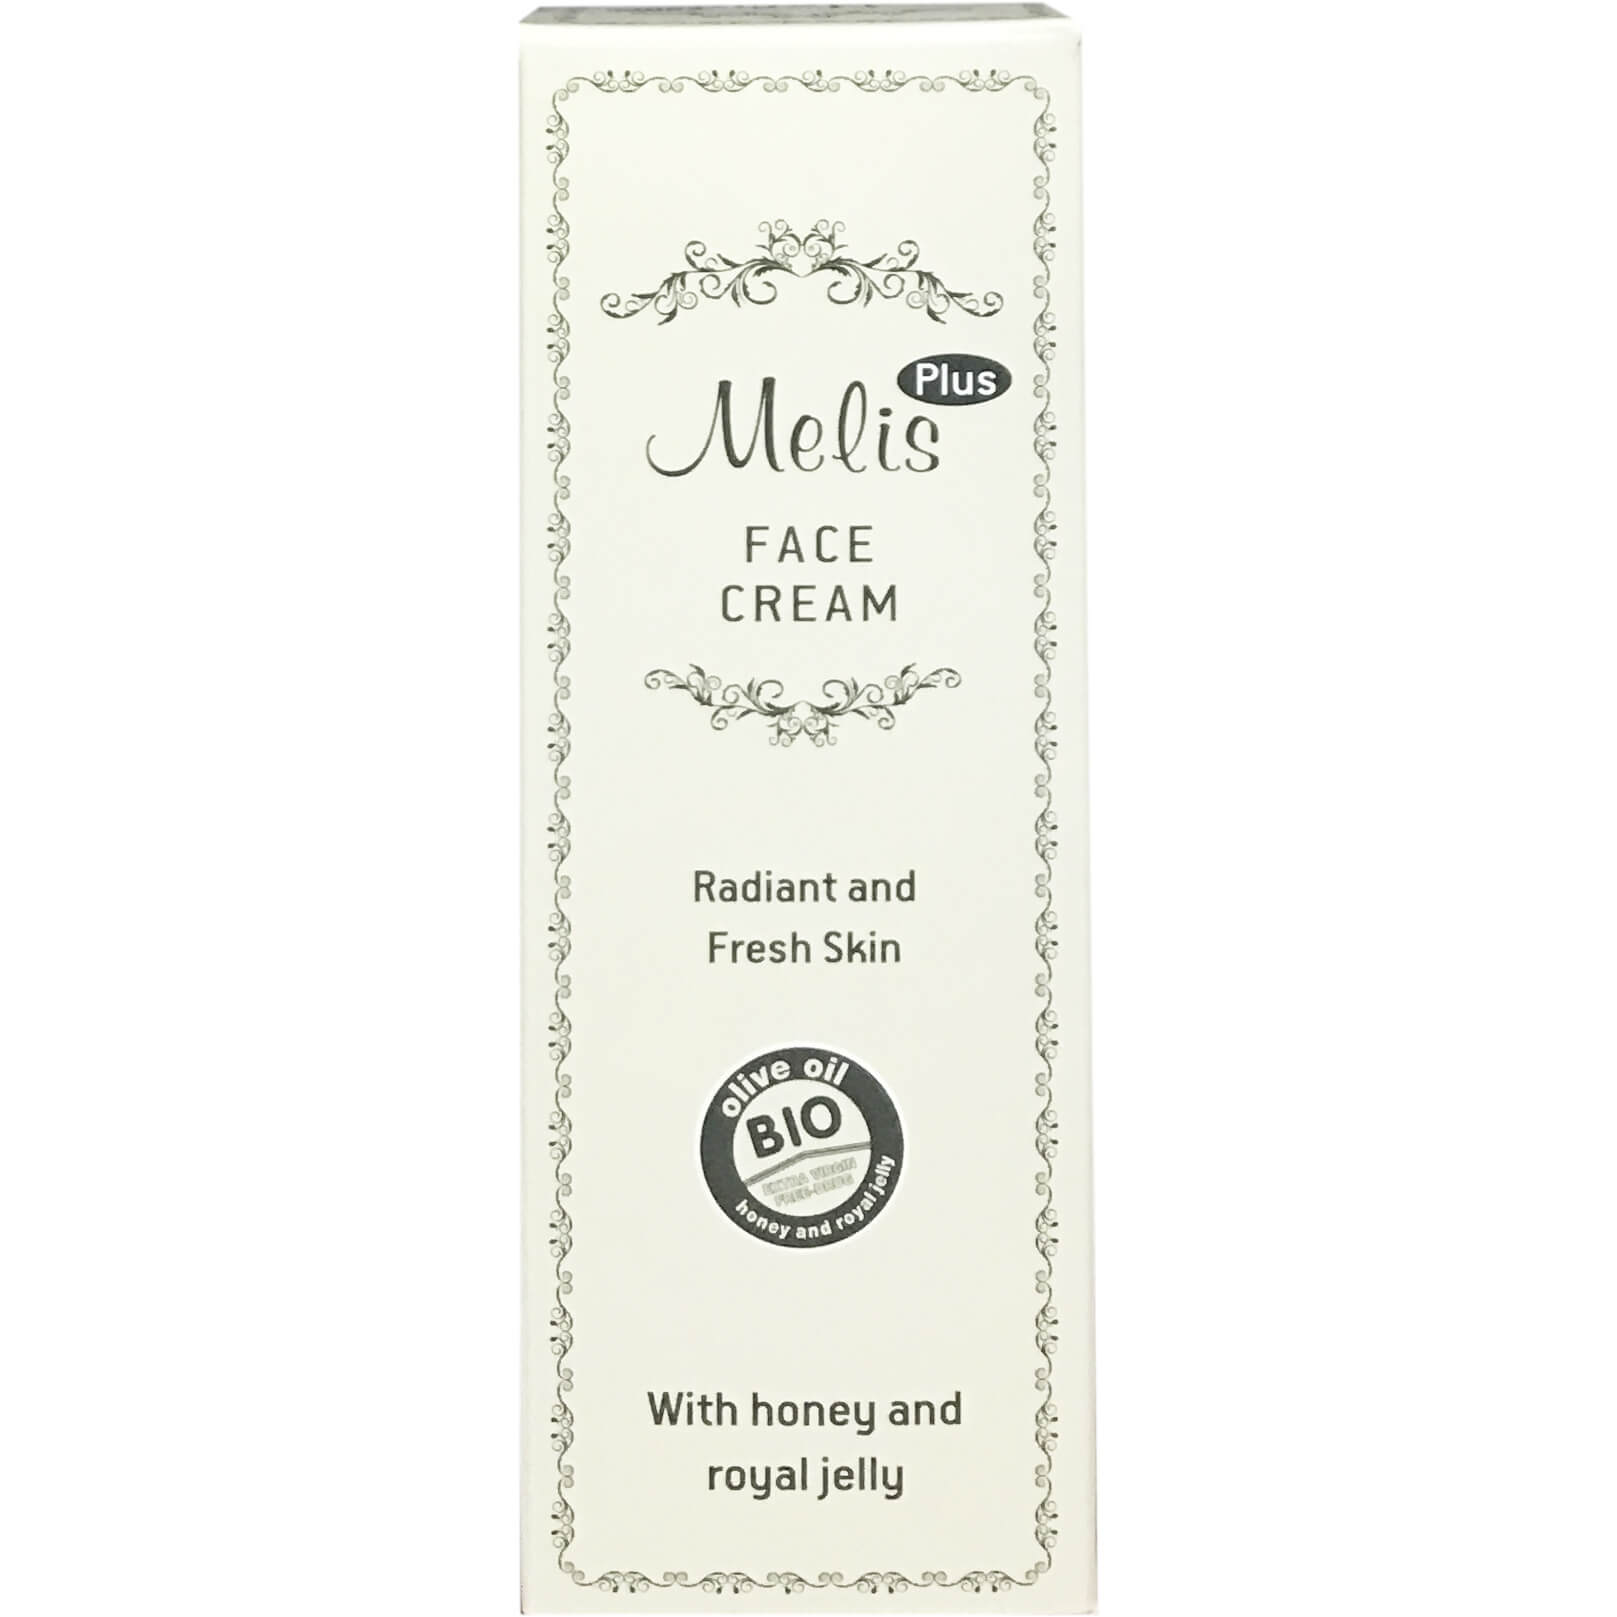 Melis Plus Day & Night Cream 24η Κρέμα Προσώπου Θρέψης, Αντιγήρανσης με Μέλι και Βασιλικό Πολτό 50ml